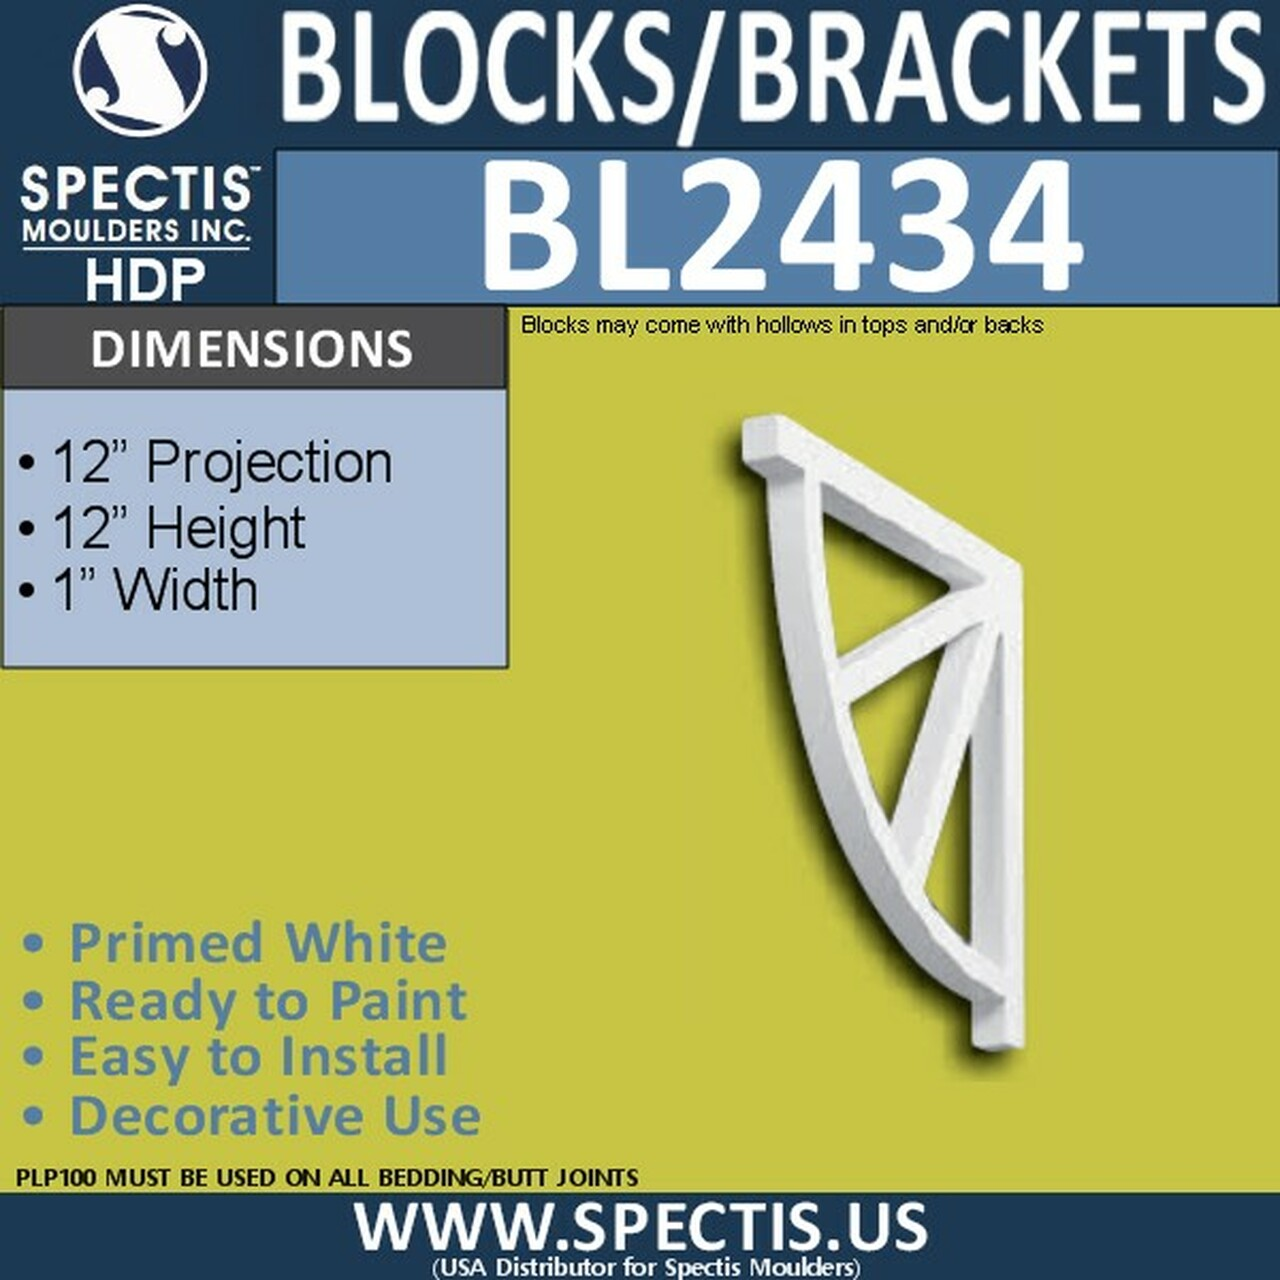 "BL2434 Eave Block or Bracket 1""W x 12""H x 12"" P"